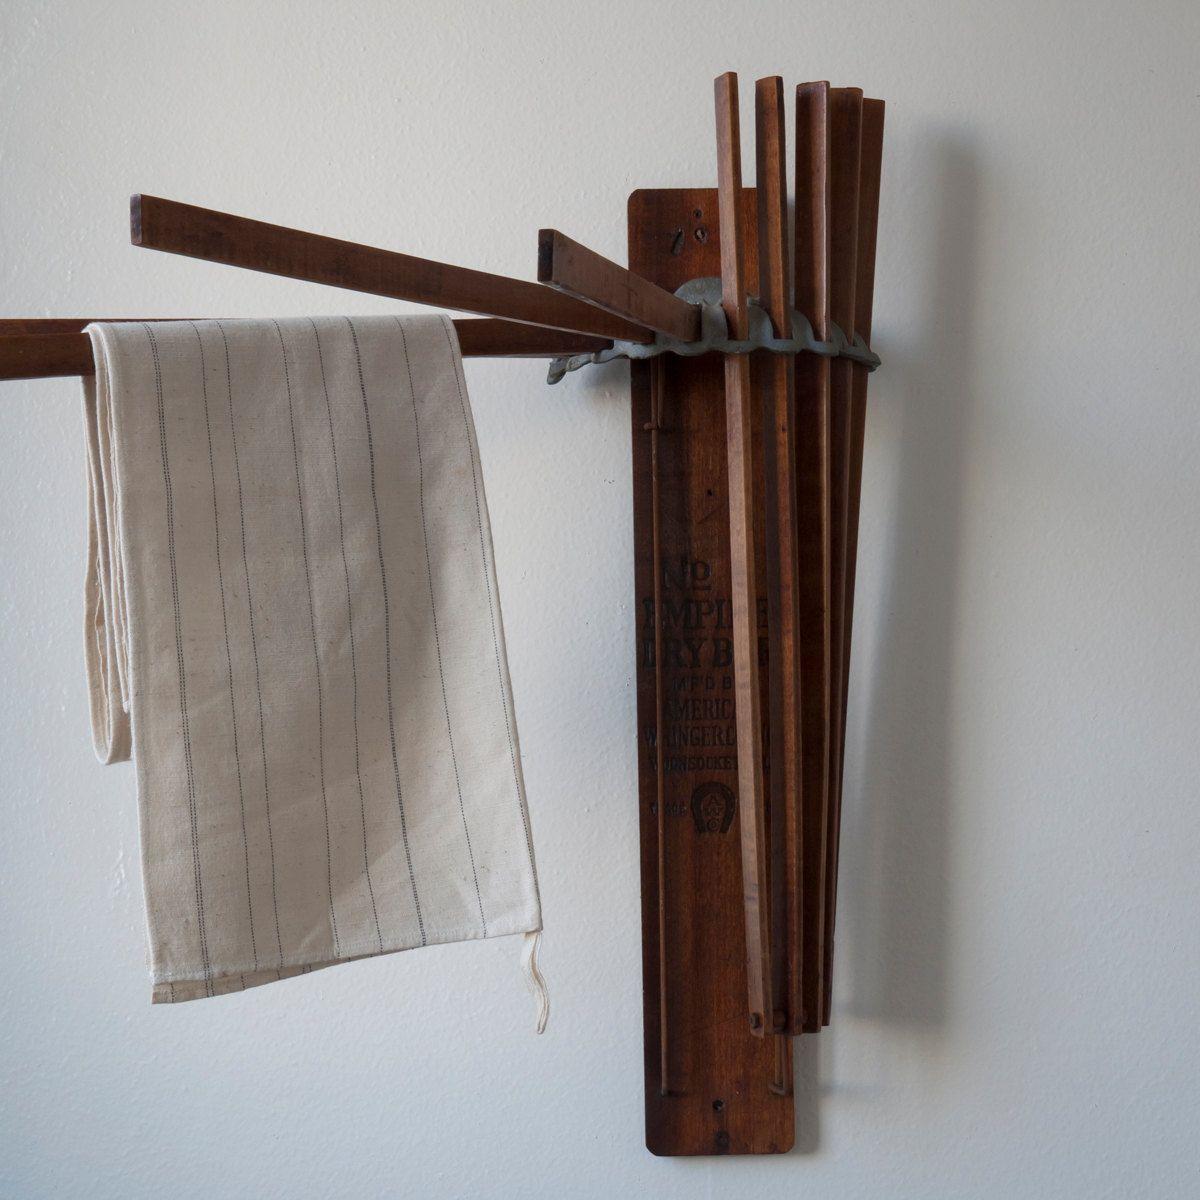 78 Old Drying Racks ideas drying rack herb drying racks wooden drying rack. Antique Wooden Drying Rack Wooden Drying Rack Wooden Clothes Drying Rack Clothes Drying Racks